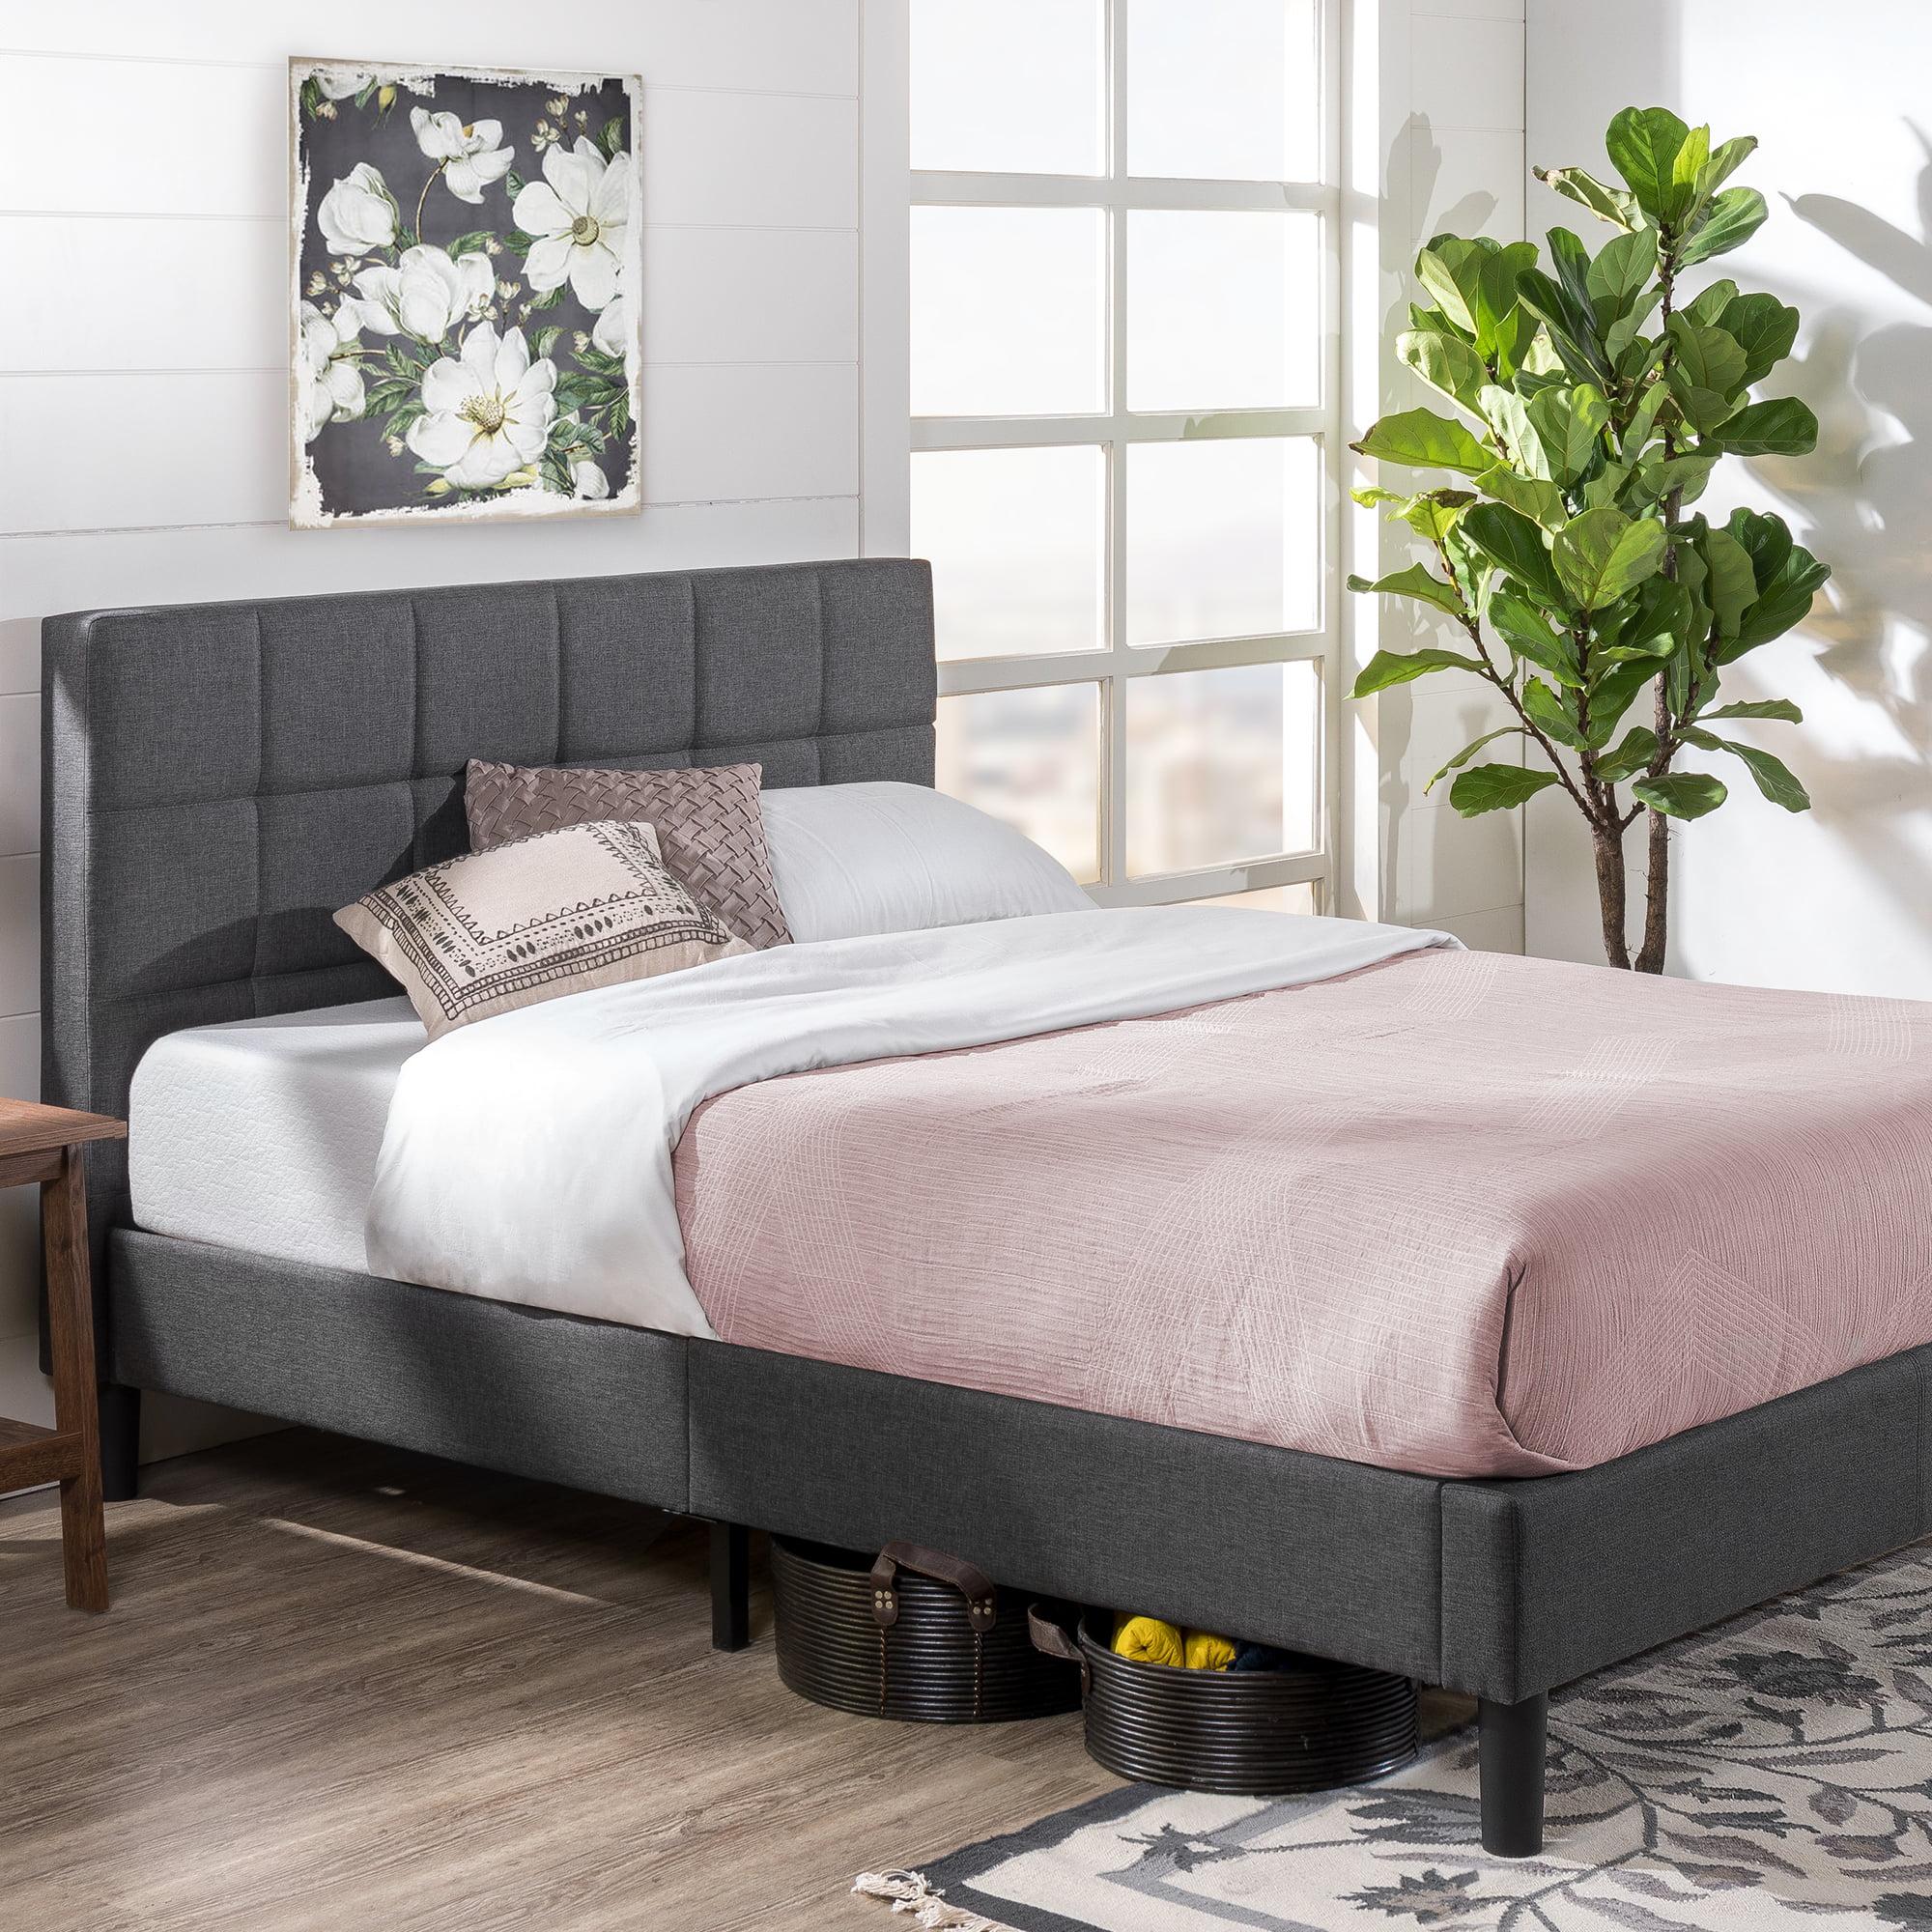 Zinus Lottie 43 Upholstered Platform Bed Frame Grey Full Walmart Com Walmart Com